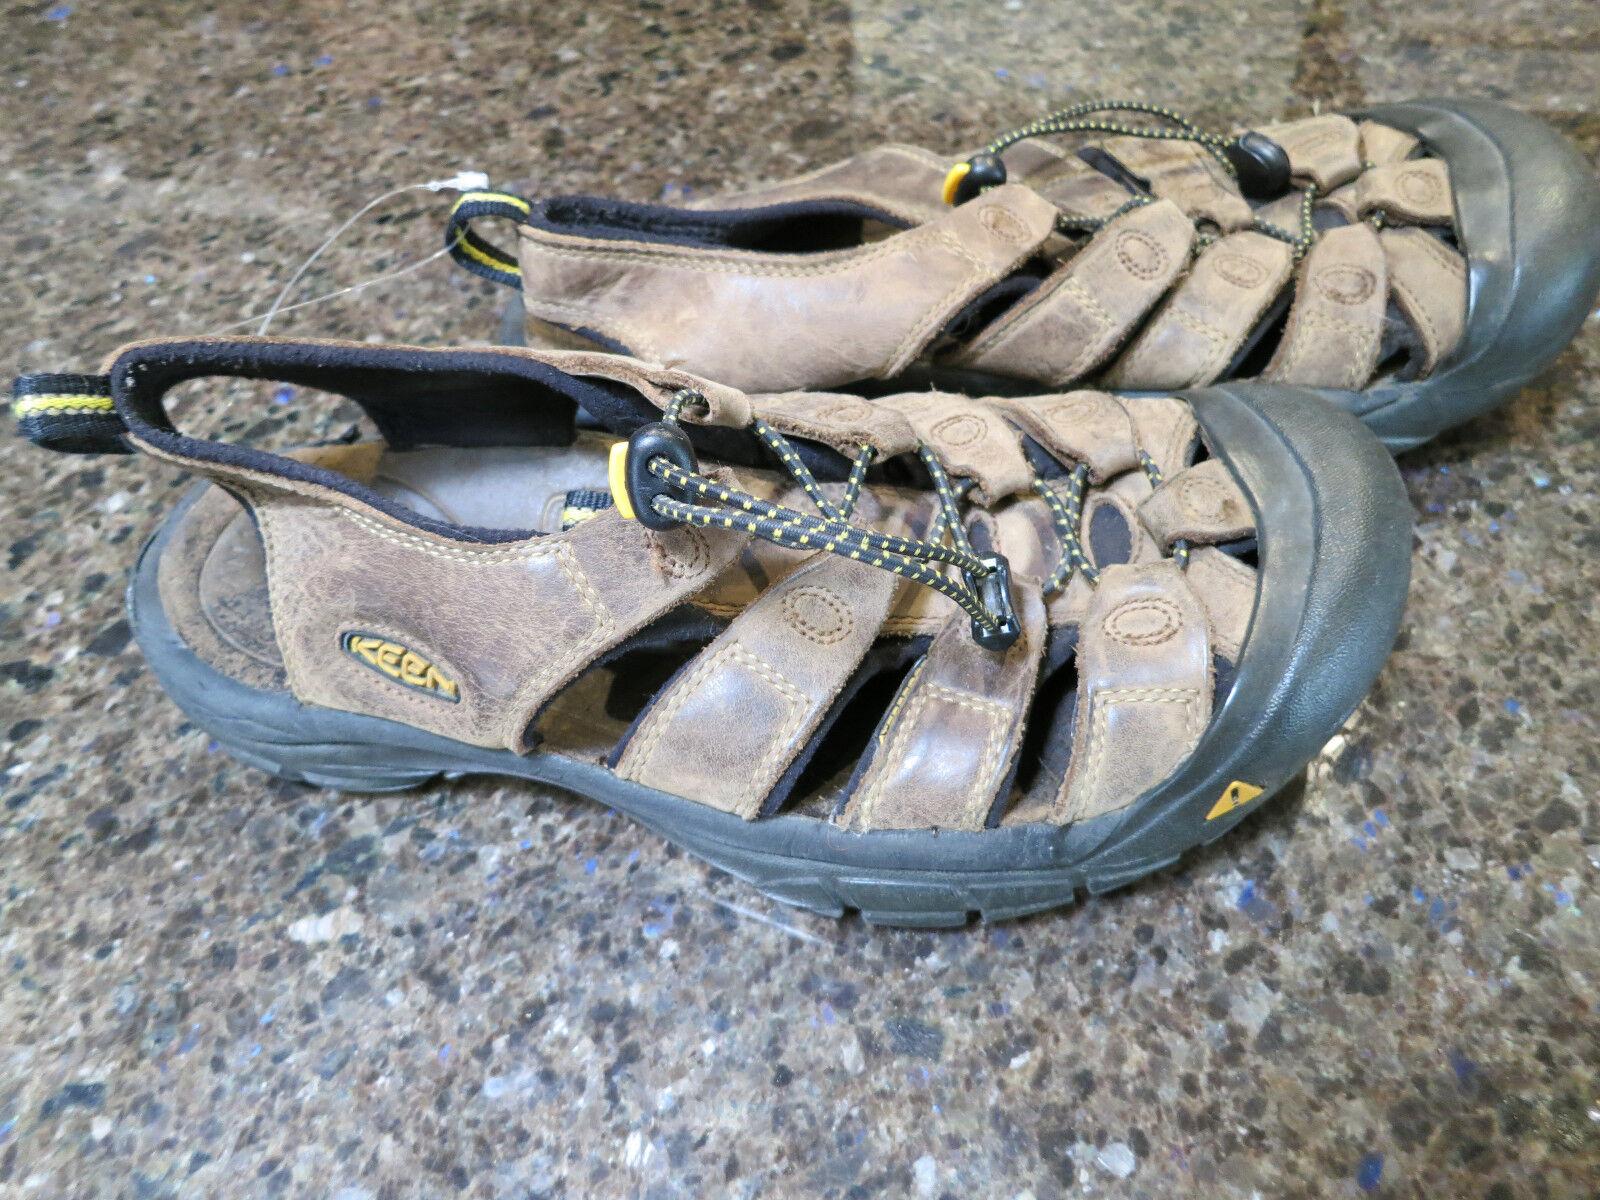 Keen Leather Newport H2 Men's Hiking Sandals Brown 9.5